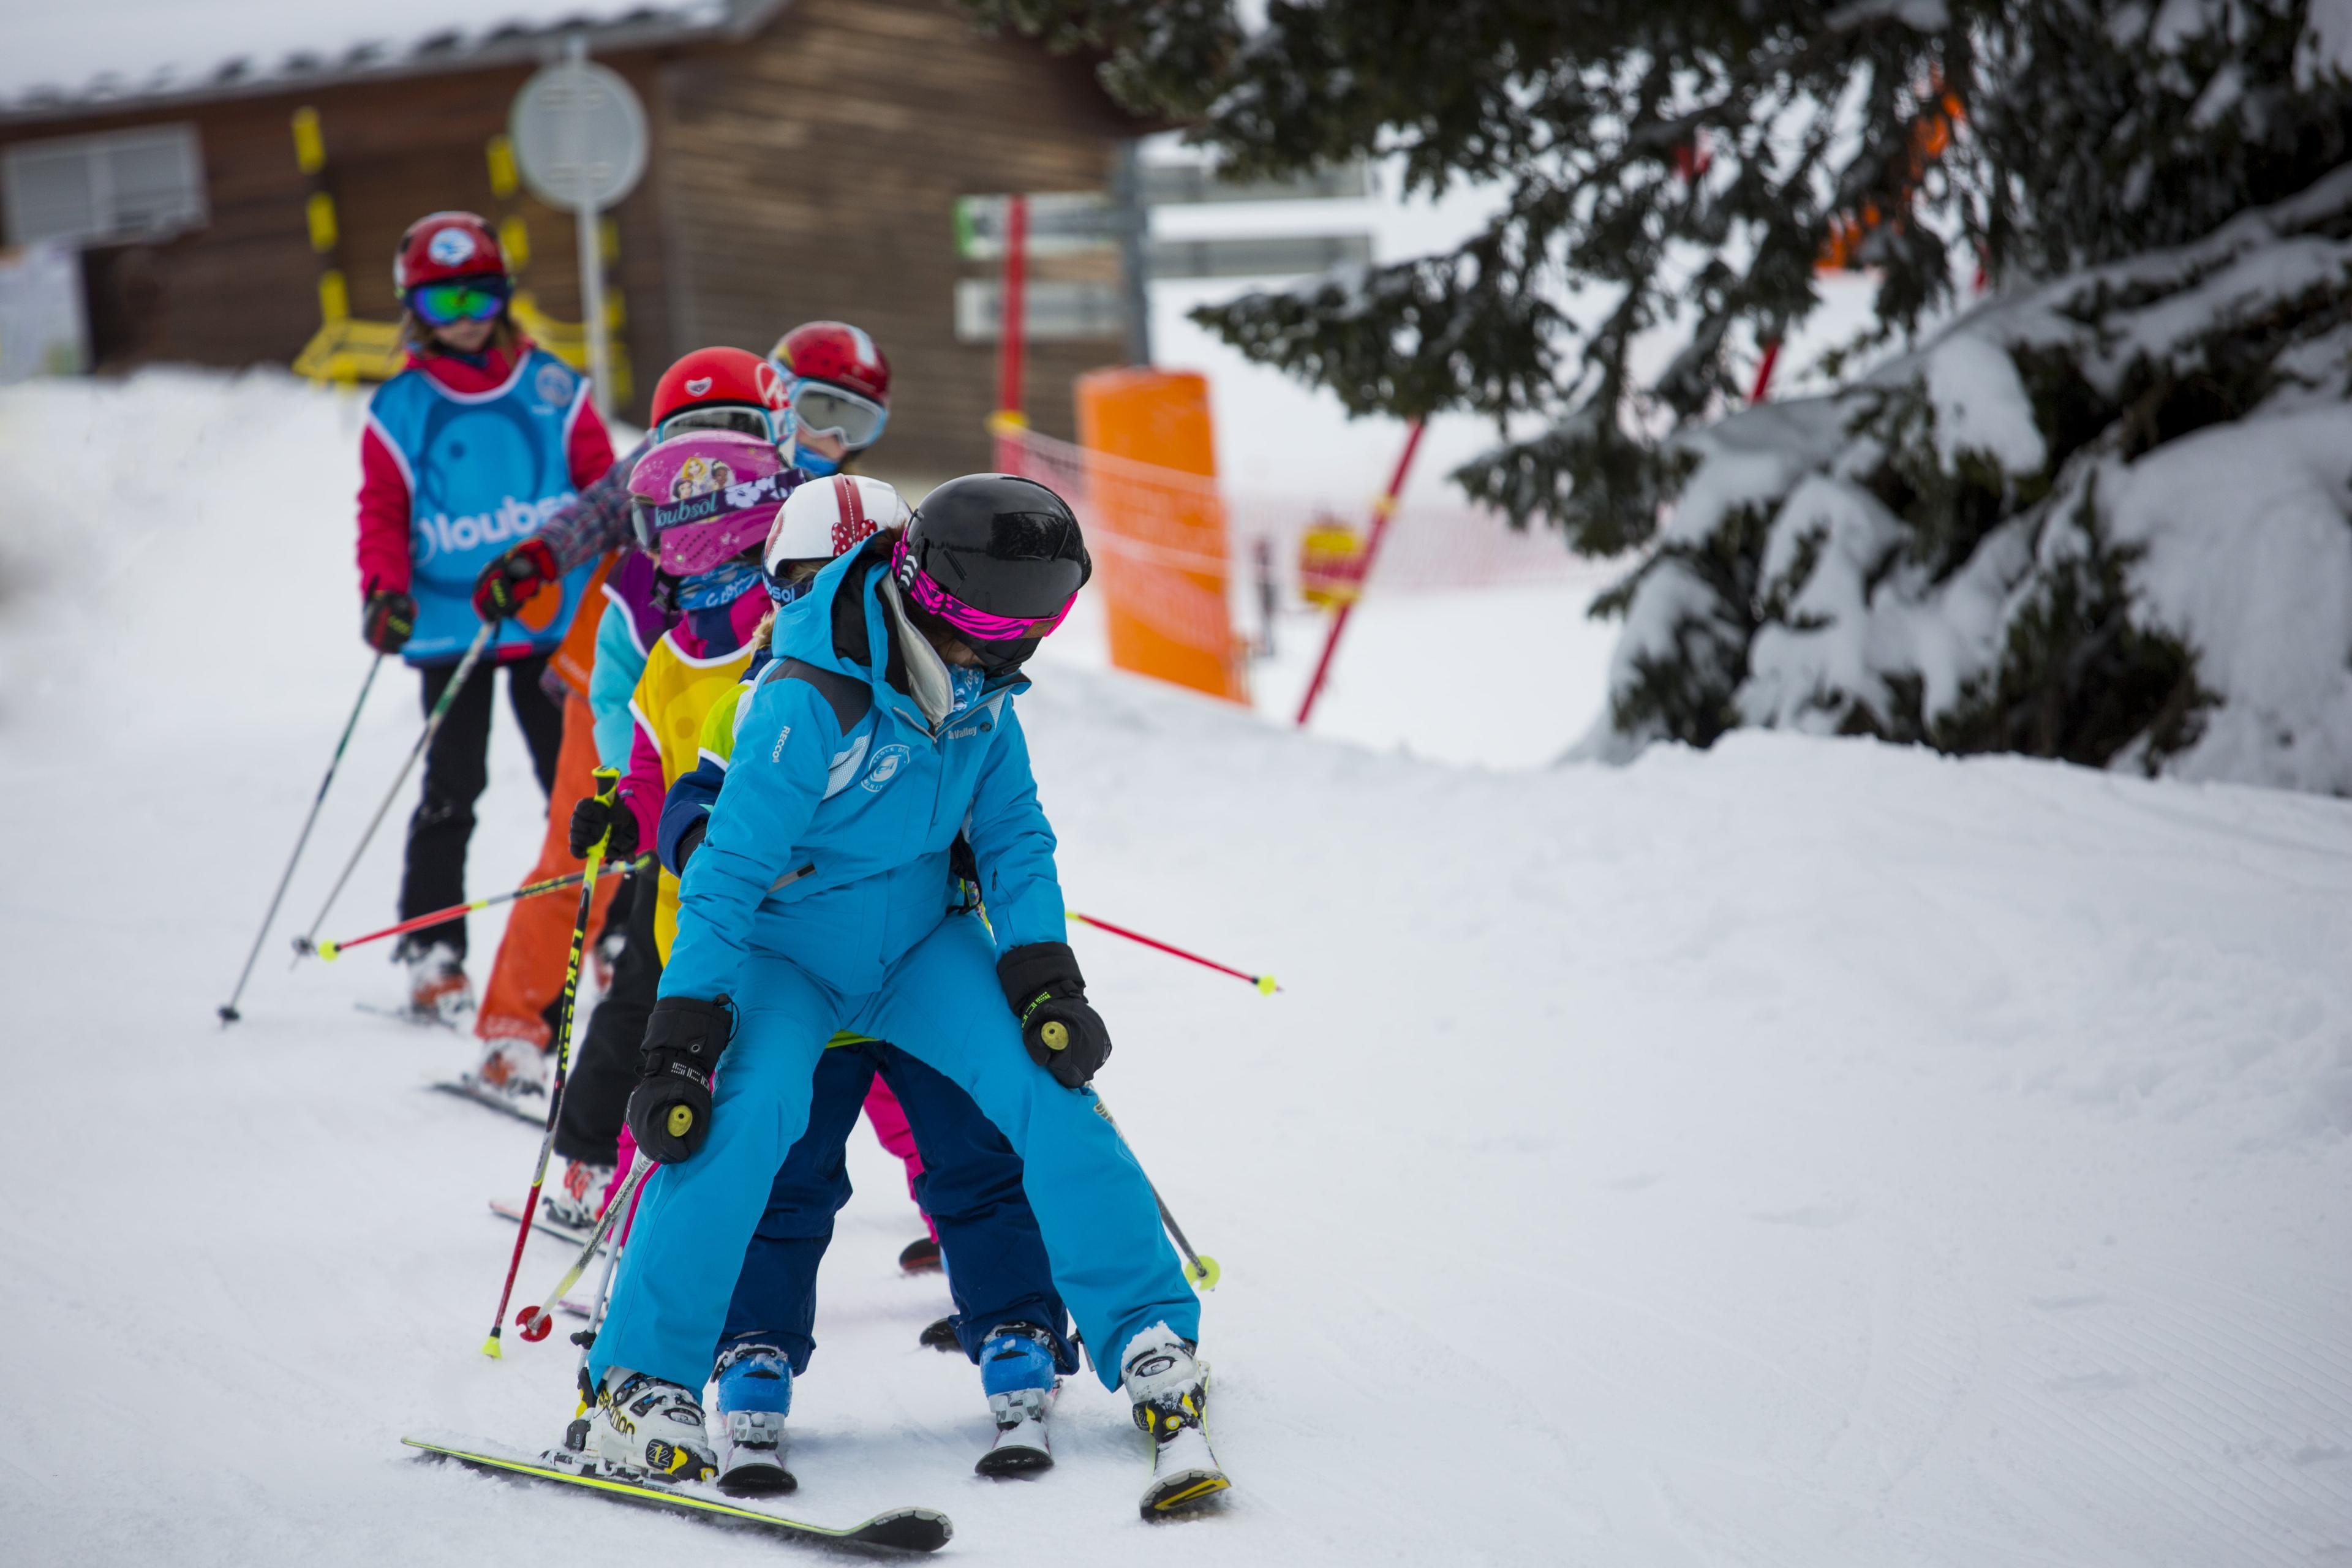 Ski Lessons for Kids (4-13 years) - Low Season